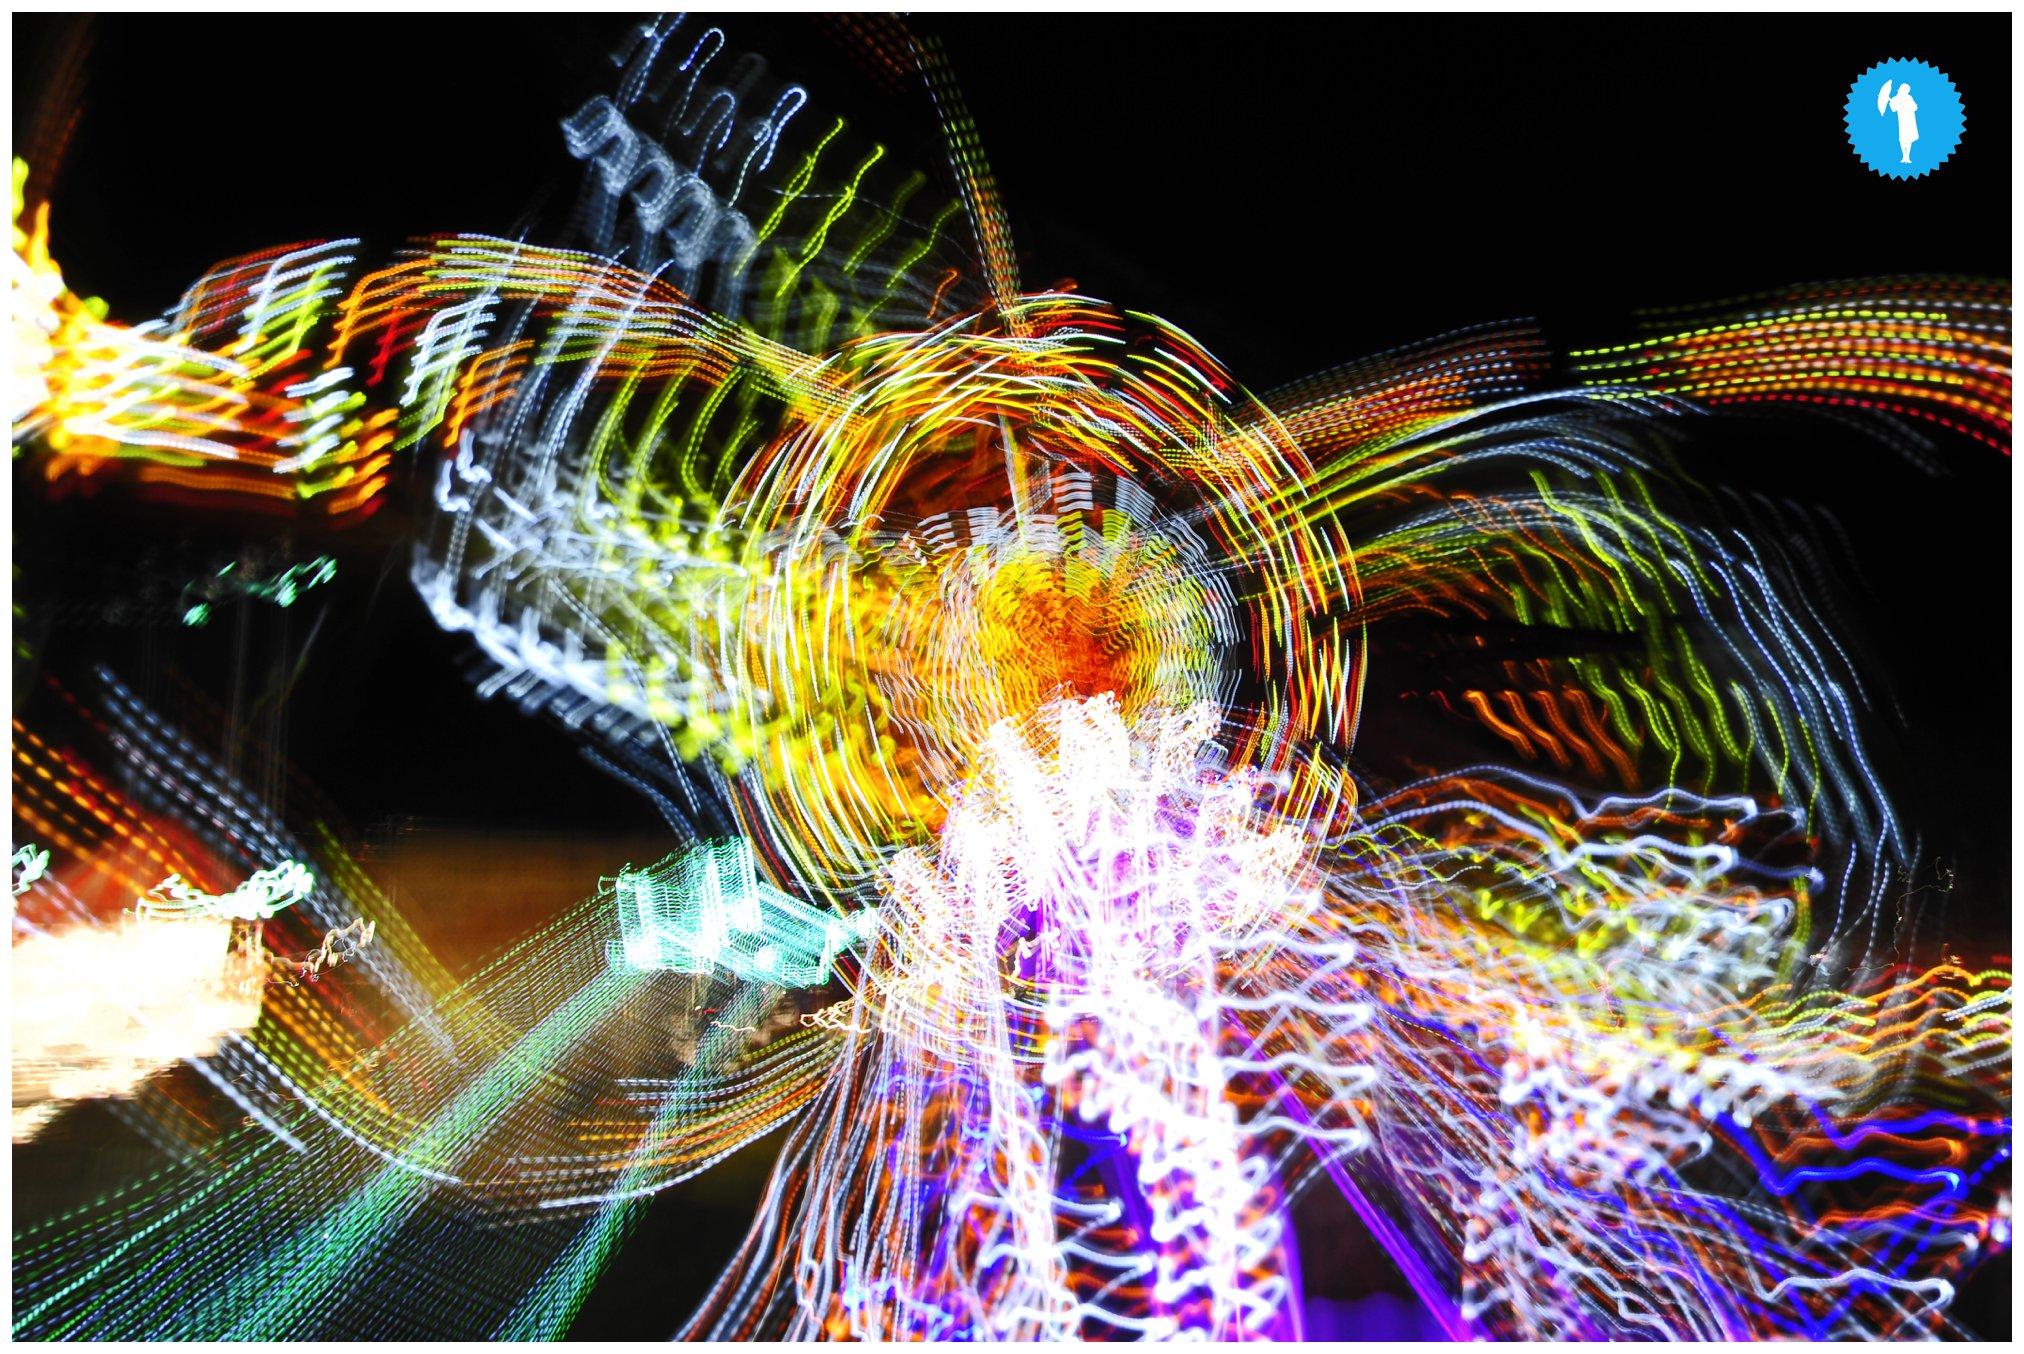 Wiarton Fair by Emily Beatty Imagery, 2013.